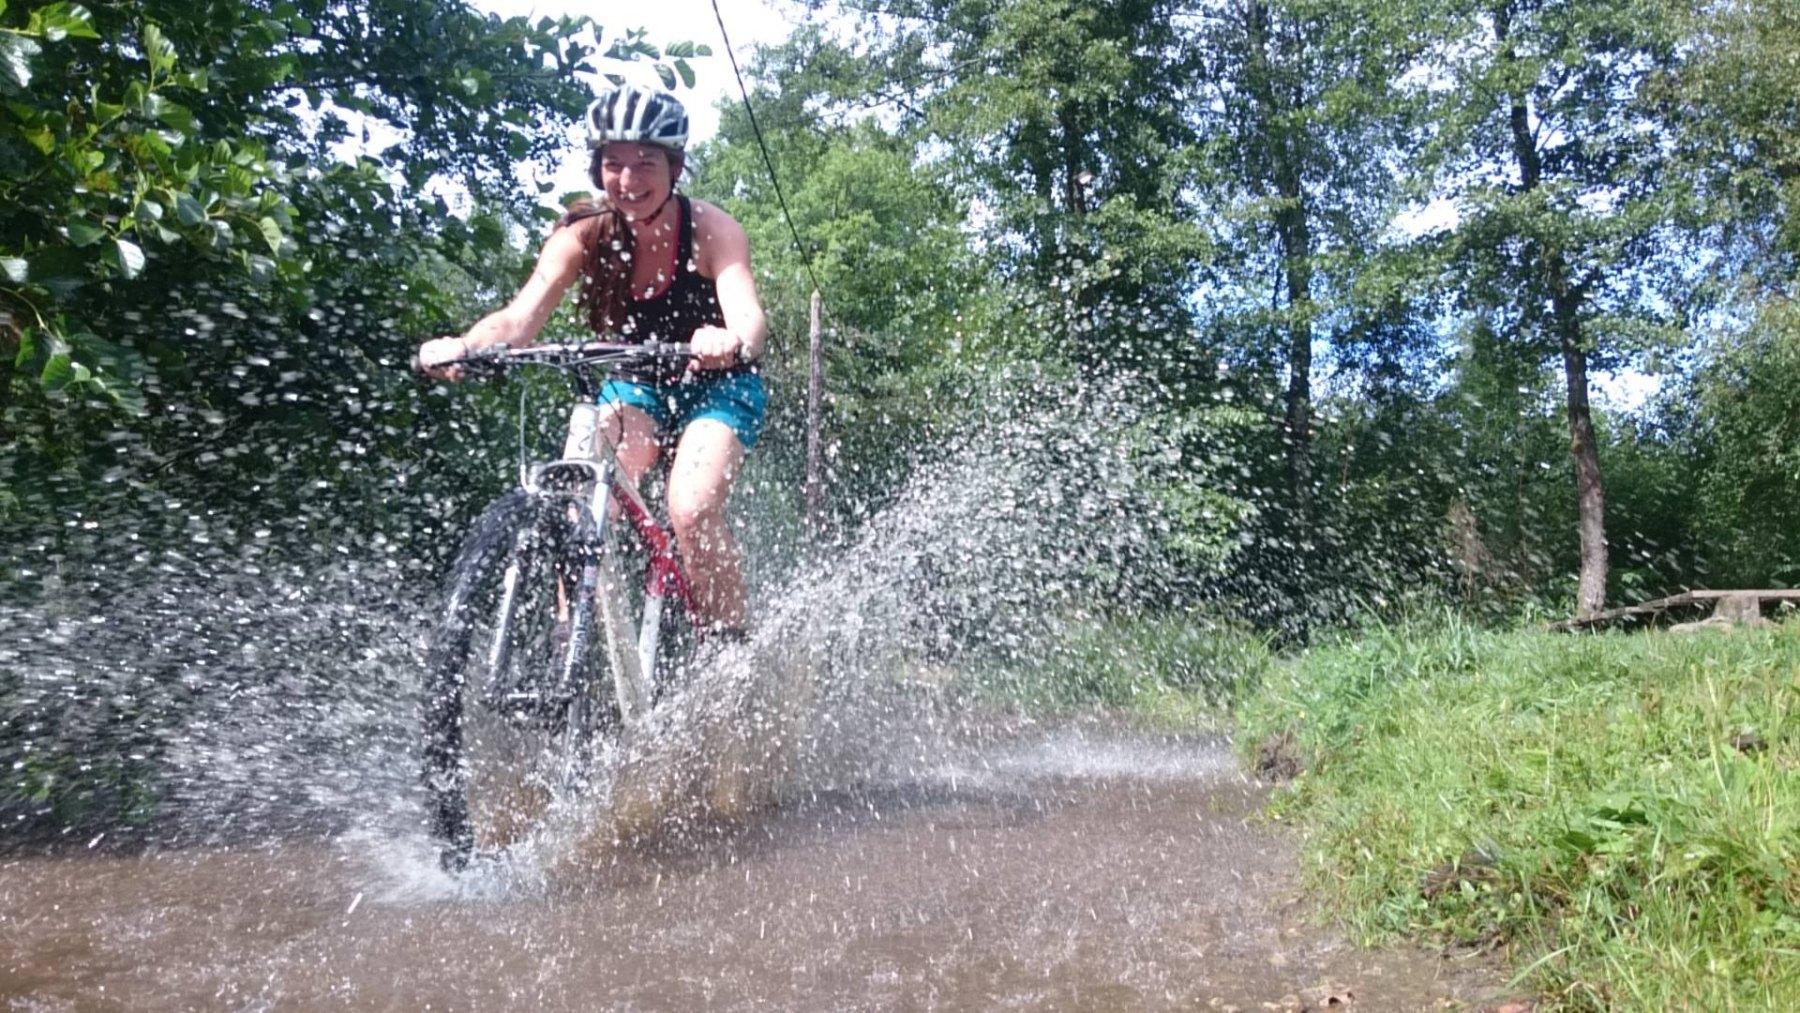 mountainbike-opspatten-lach-plezier-enja